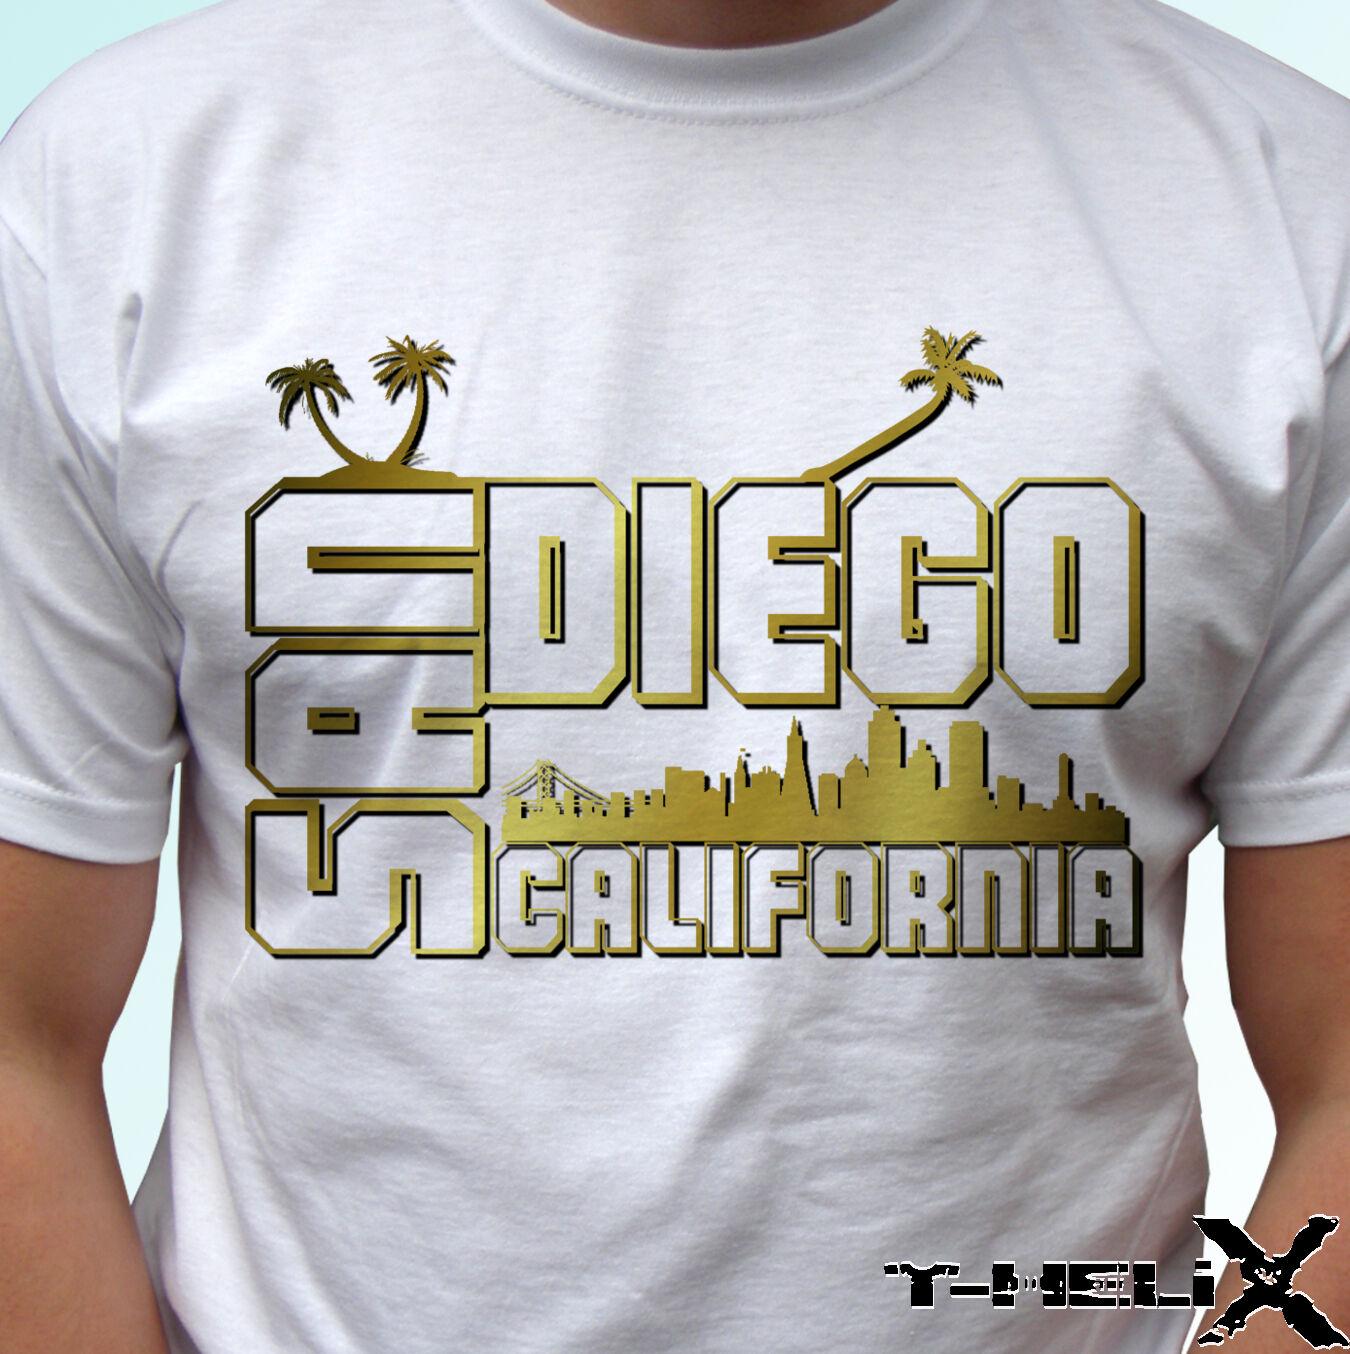 San Diego California USA T-Shirt San Diego Ni/ños Chicos Chicas Unisexo Camiseta Blanco